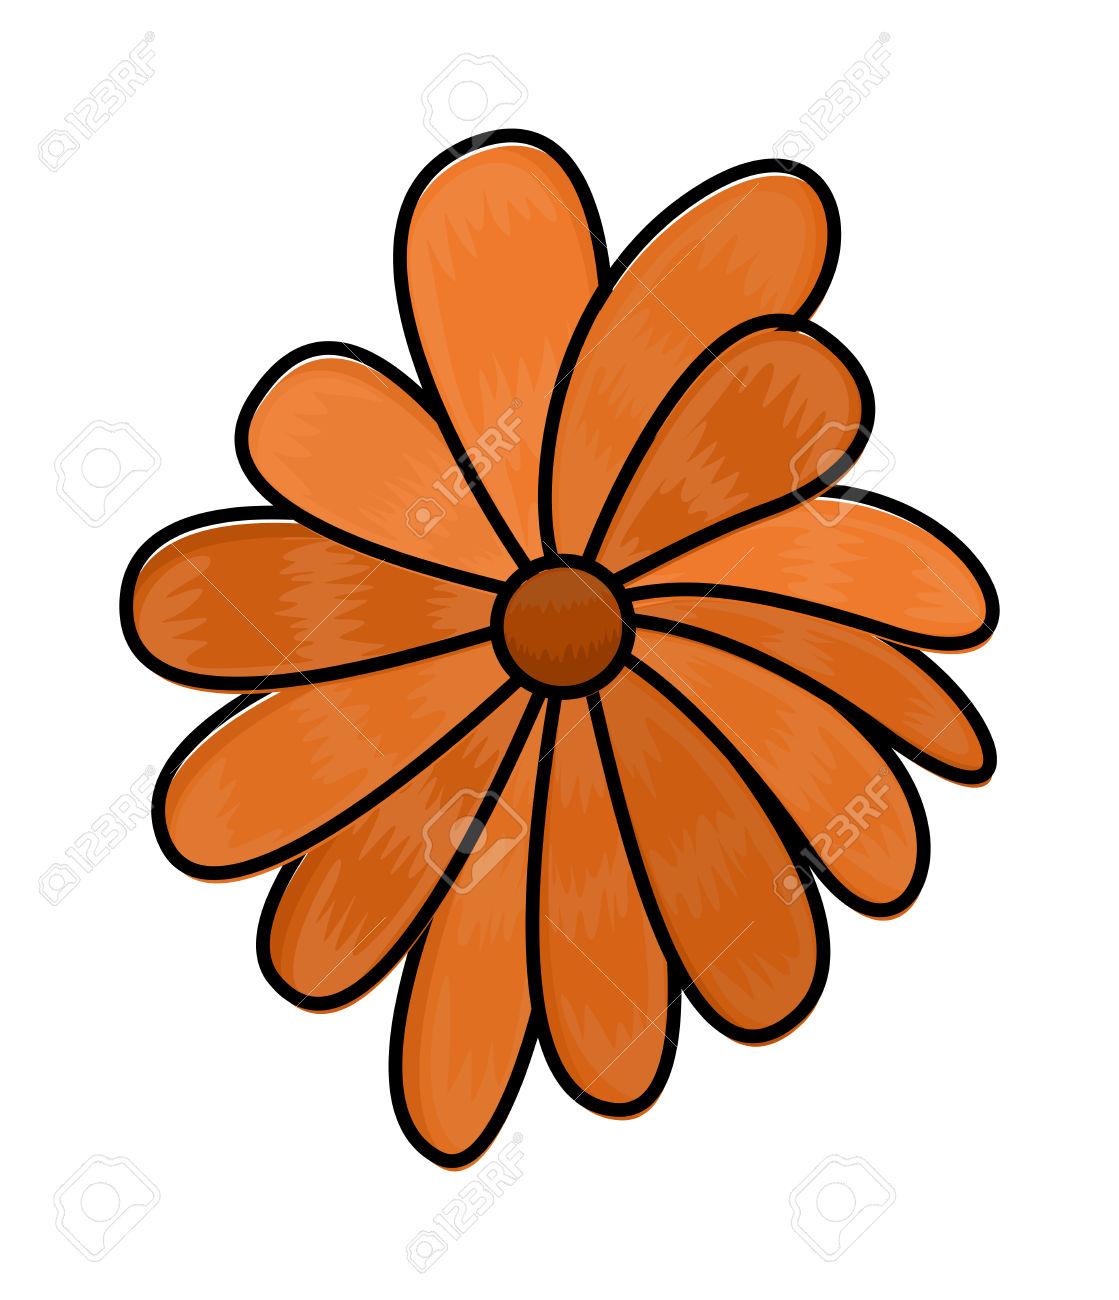 Orange Flower clipart #9, Download drawings